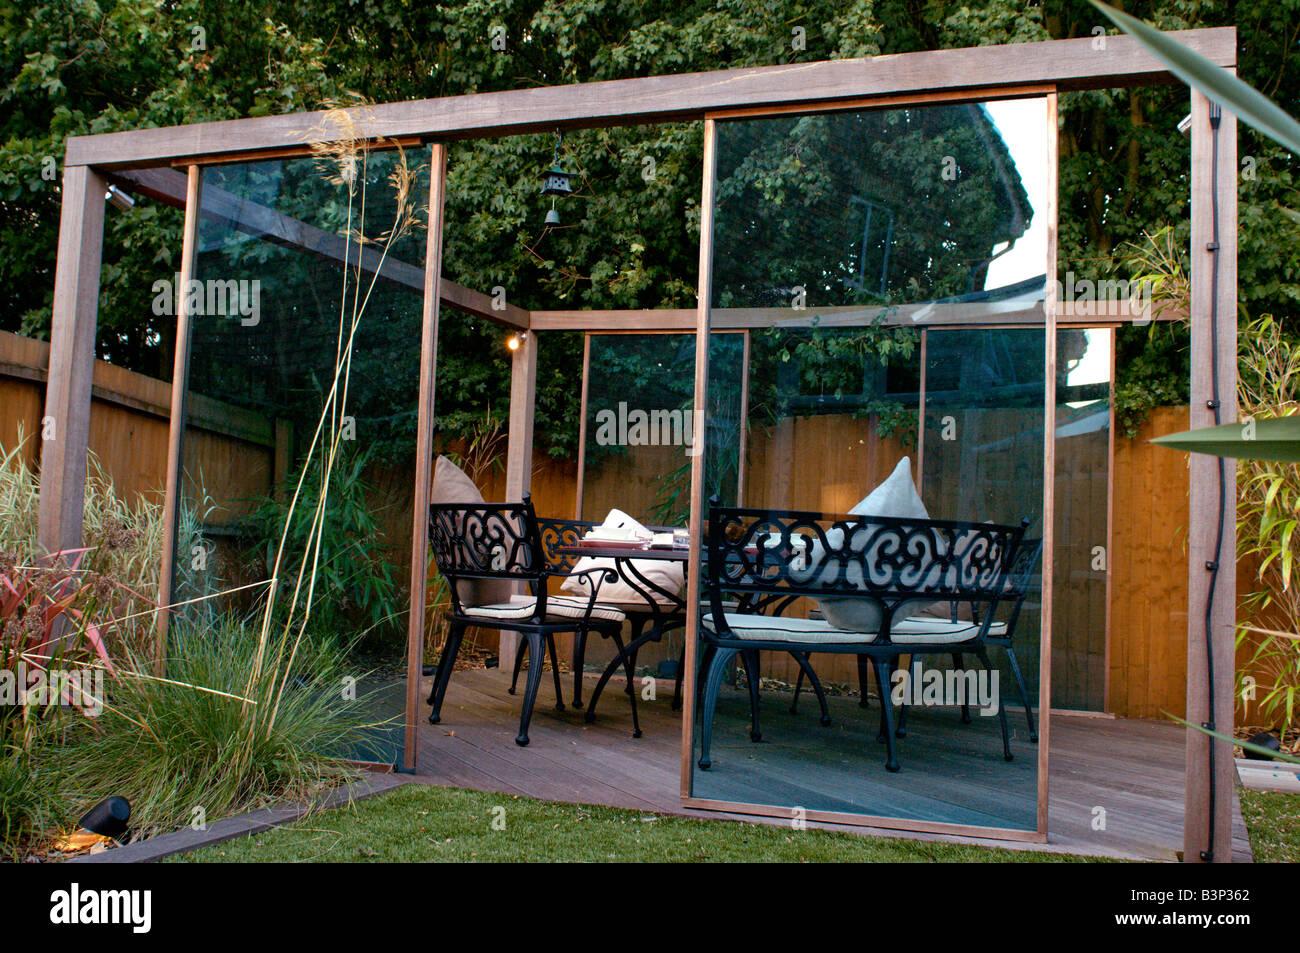 Perfect Outdoor Dining Set Under Gazebo In Modern Landscaped Garden